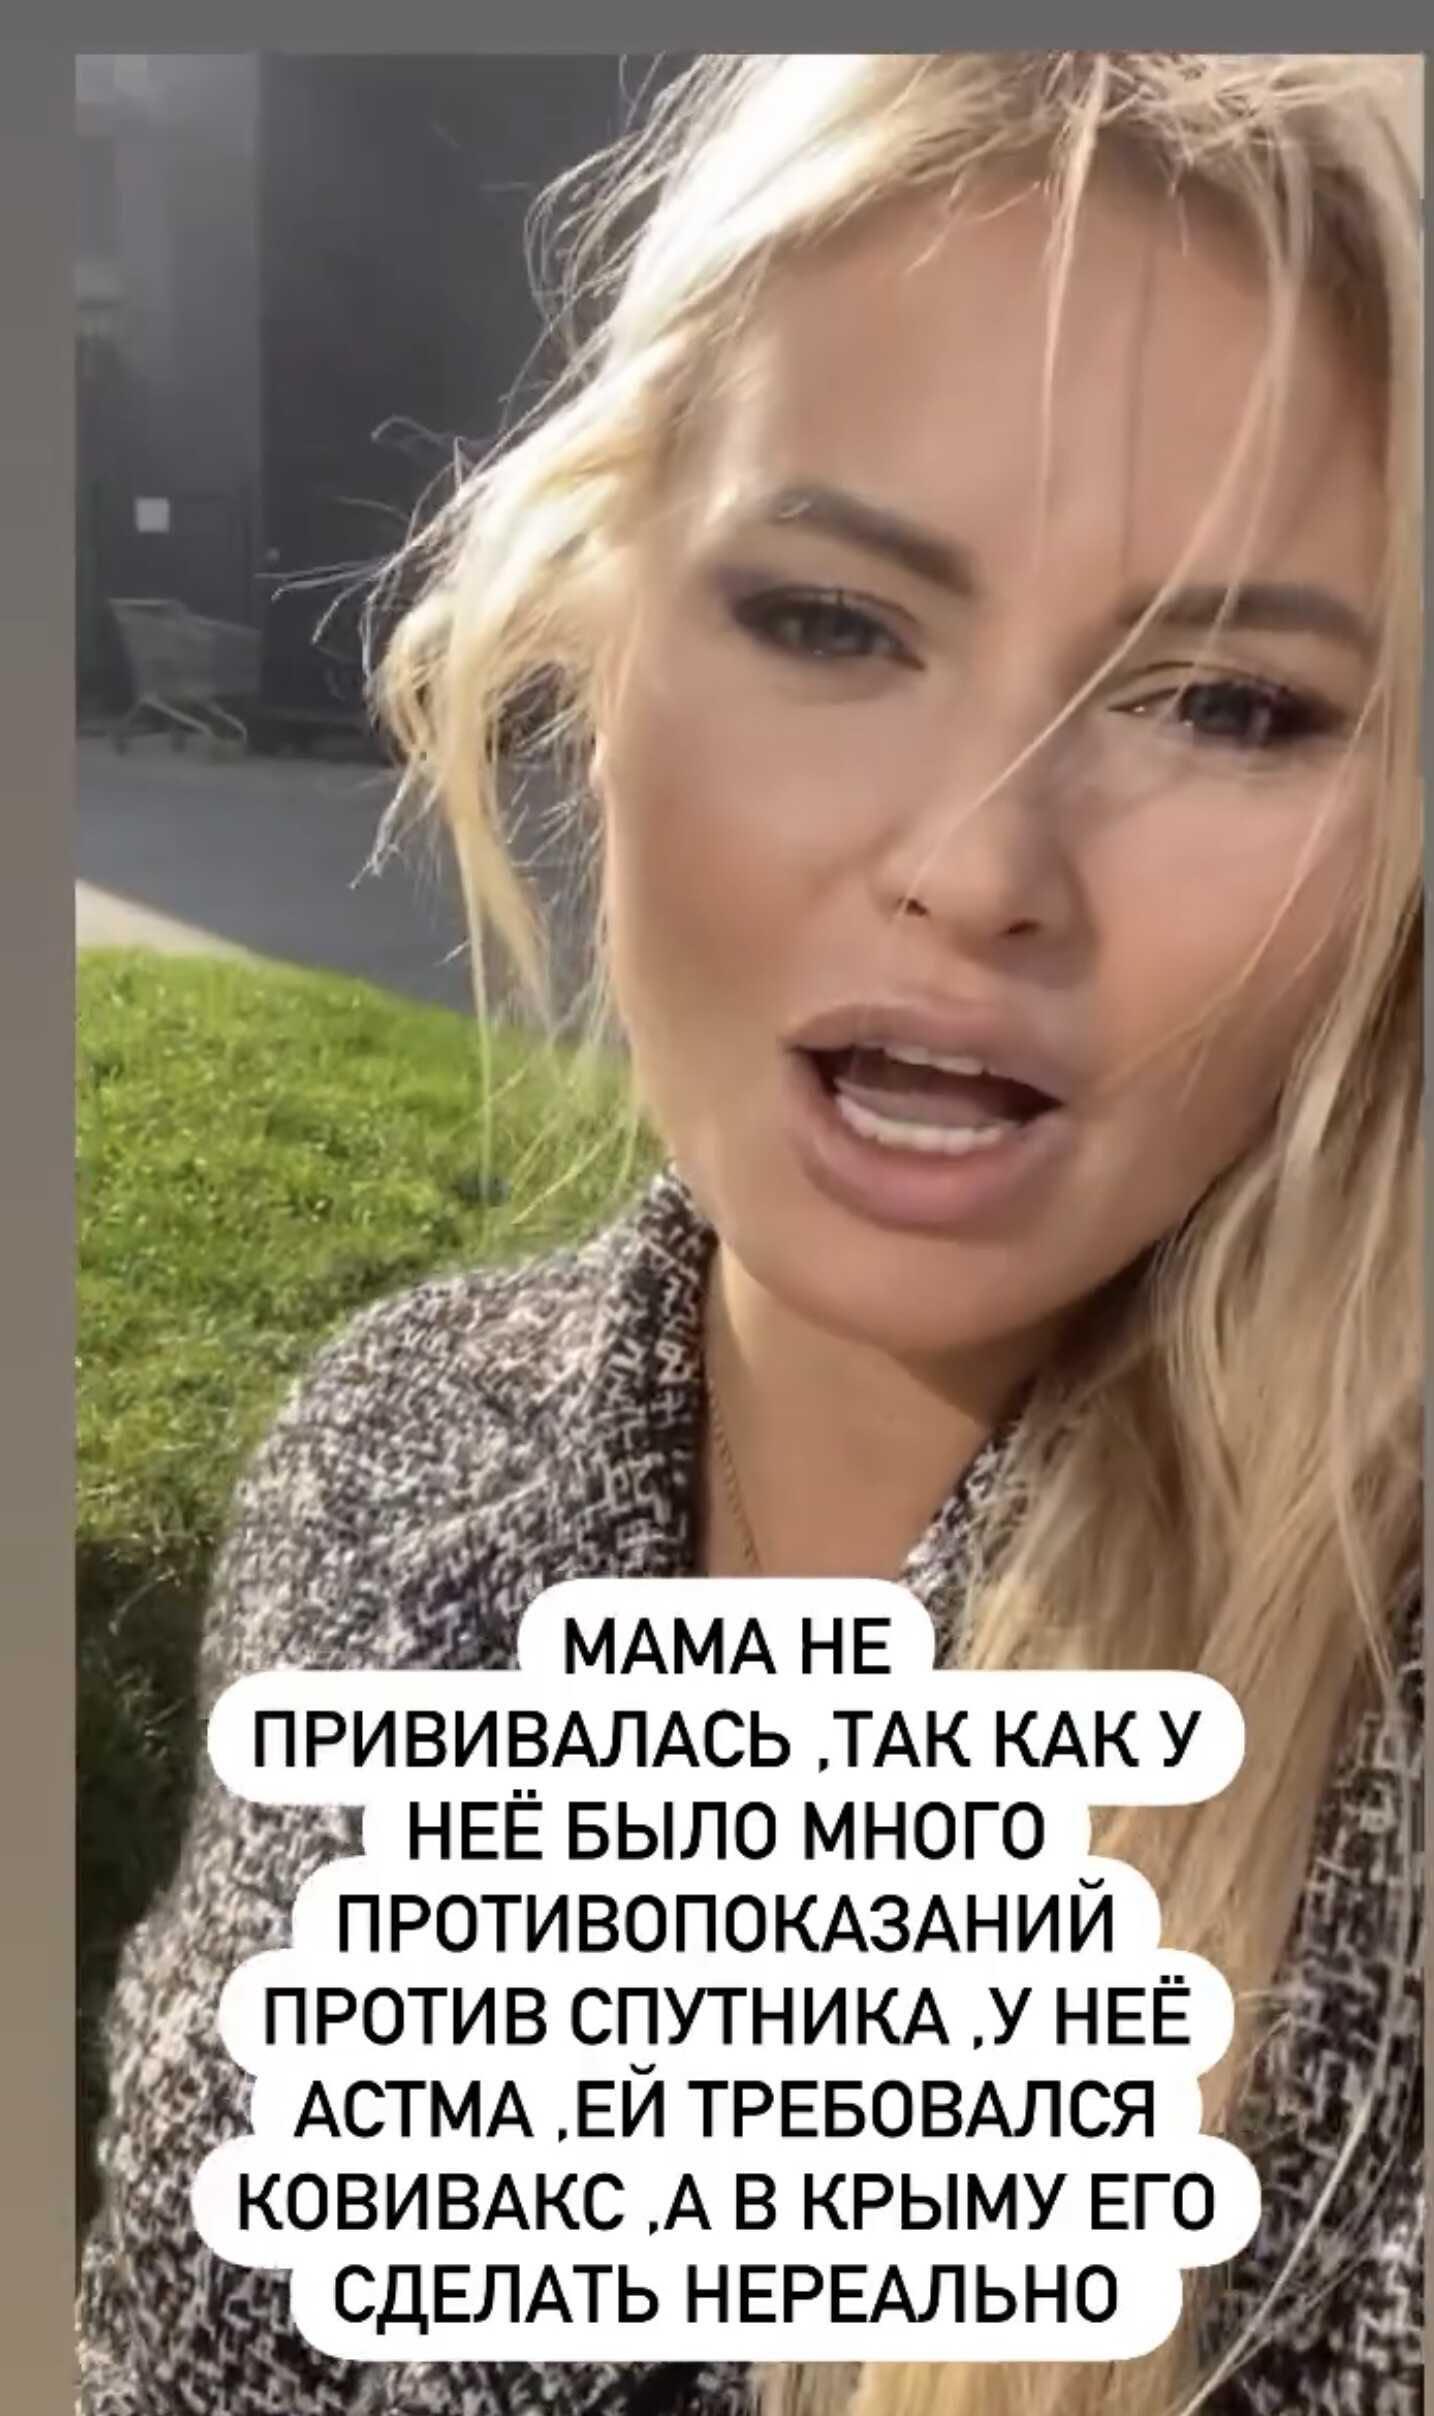 Мама Даны Борисовой госпитализирована